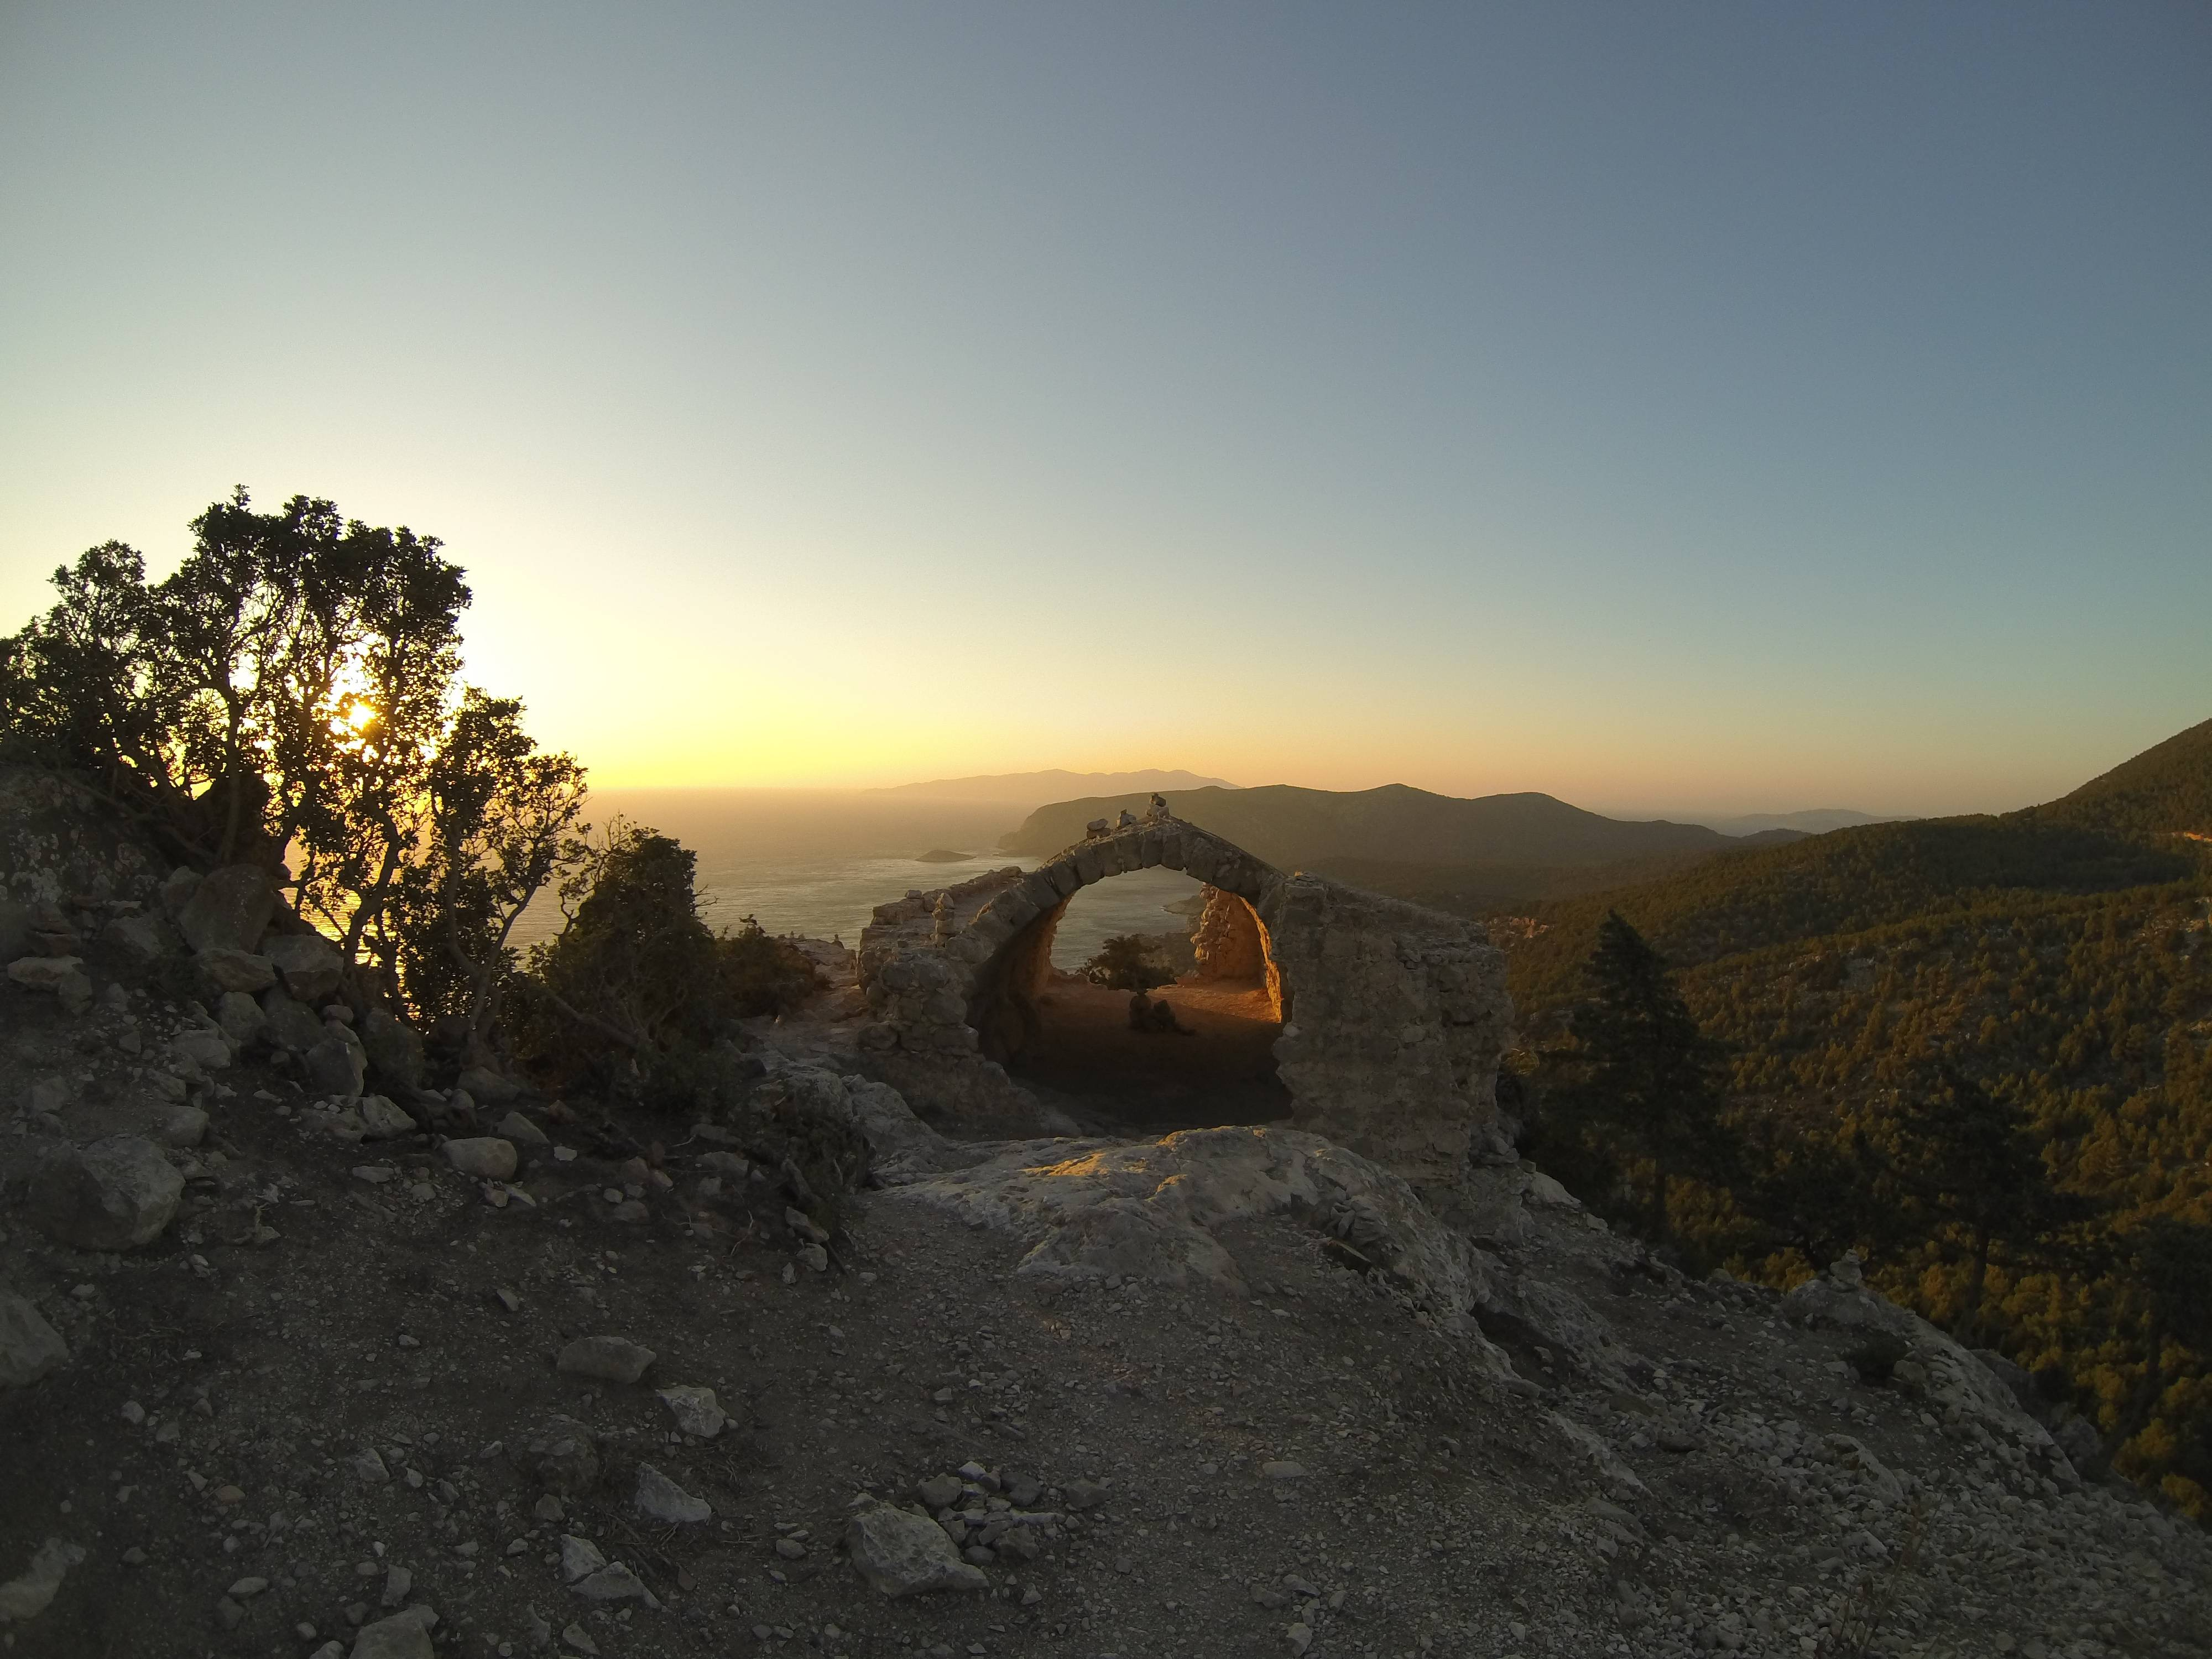 Photo 2: Sunset à Monolithos !